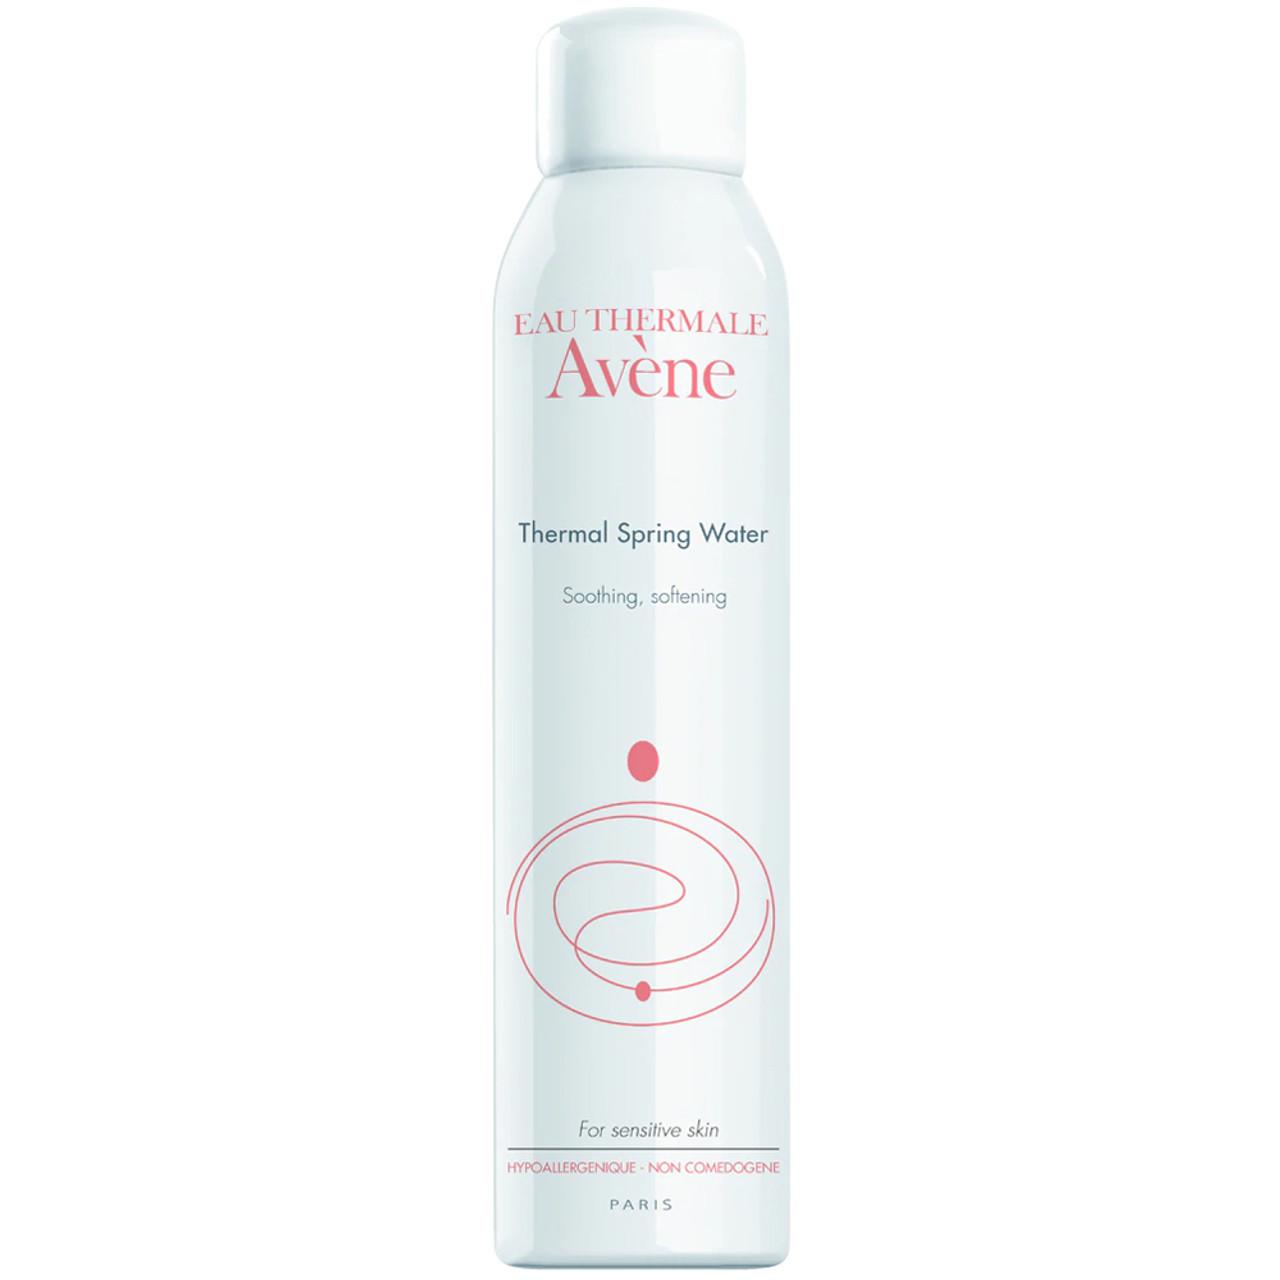 Avene Thermal Spring Water - 300mL